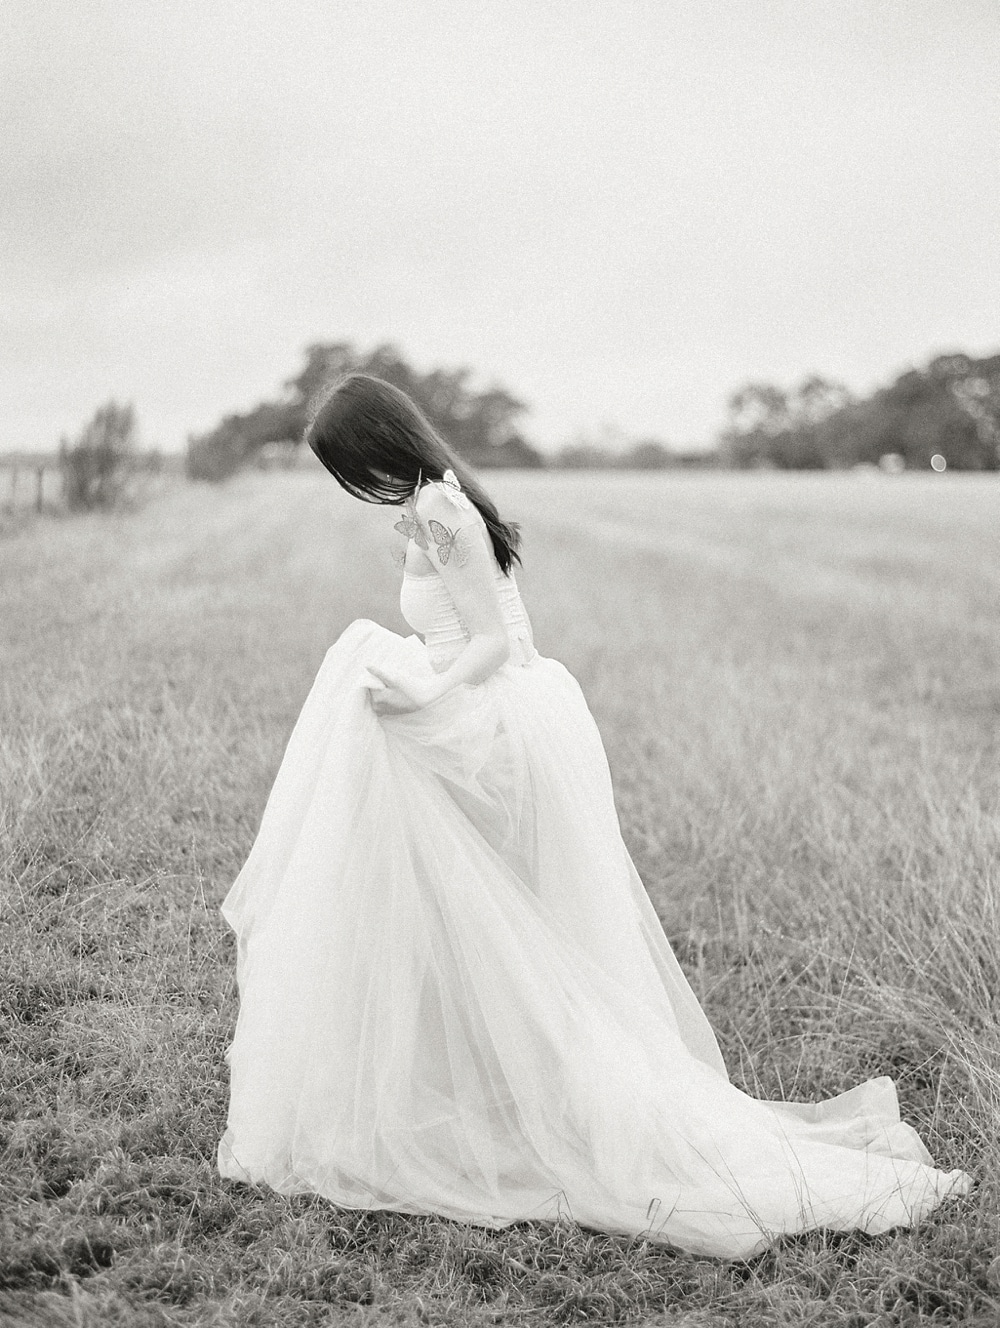 Kristin-La-Voie-Photography-fine-art-wedding-bridal-boudoir-texas-photographer-Dallas-Austin-San-Marcos-wahwahtaysee-resort-79